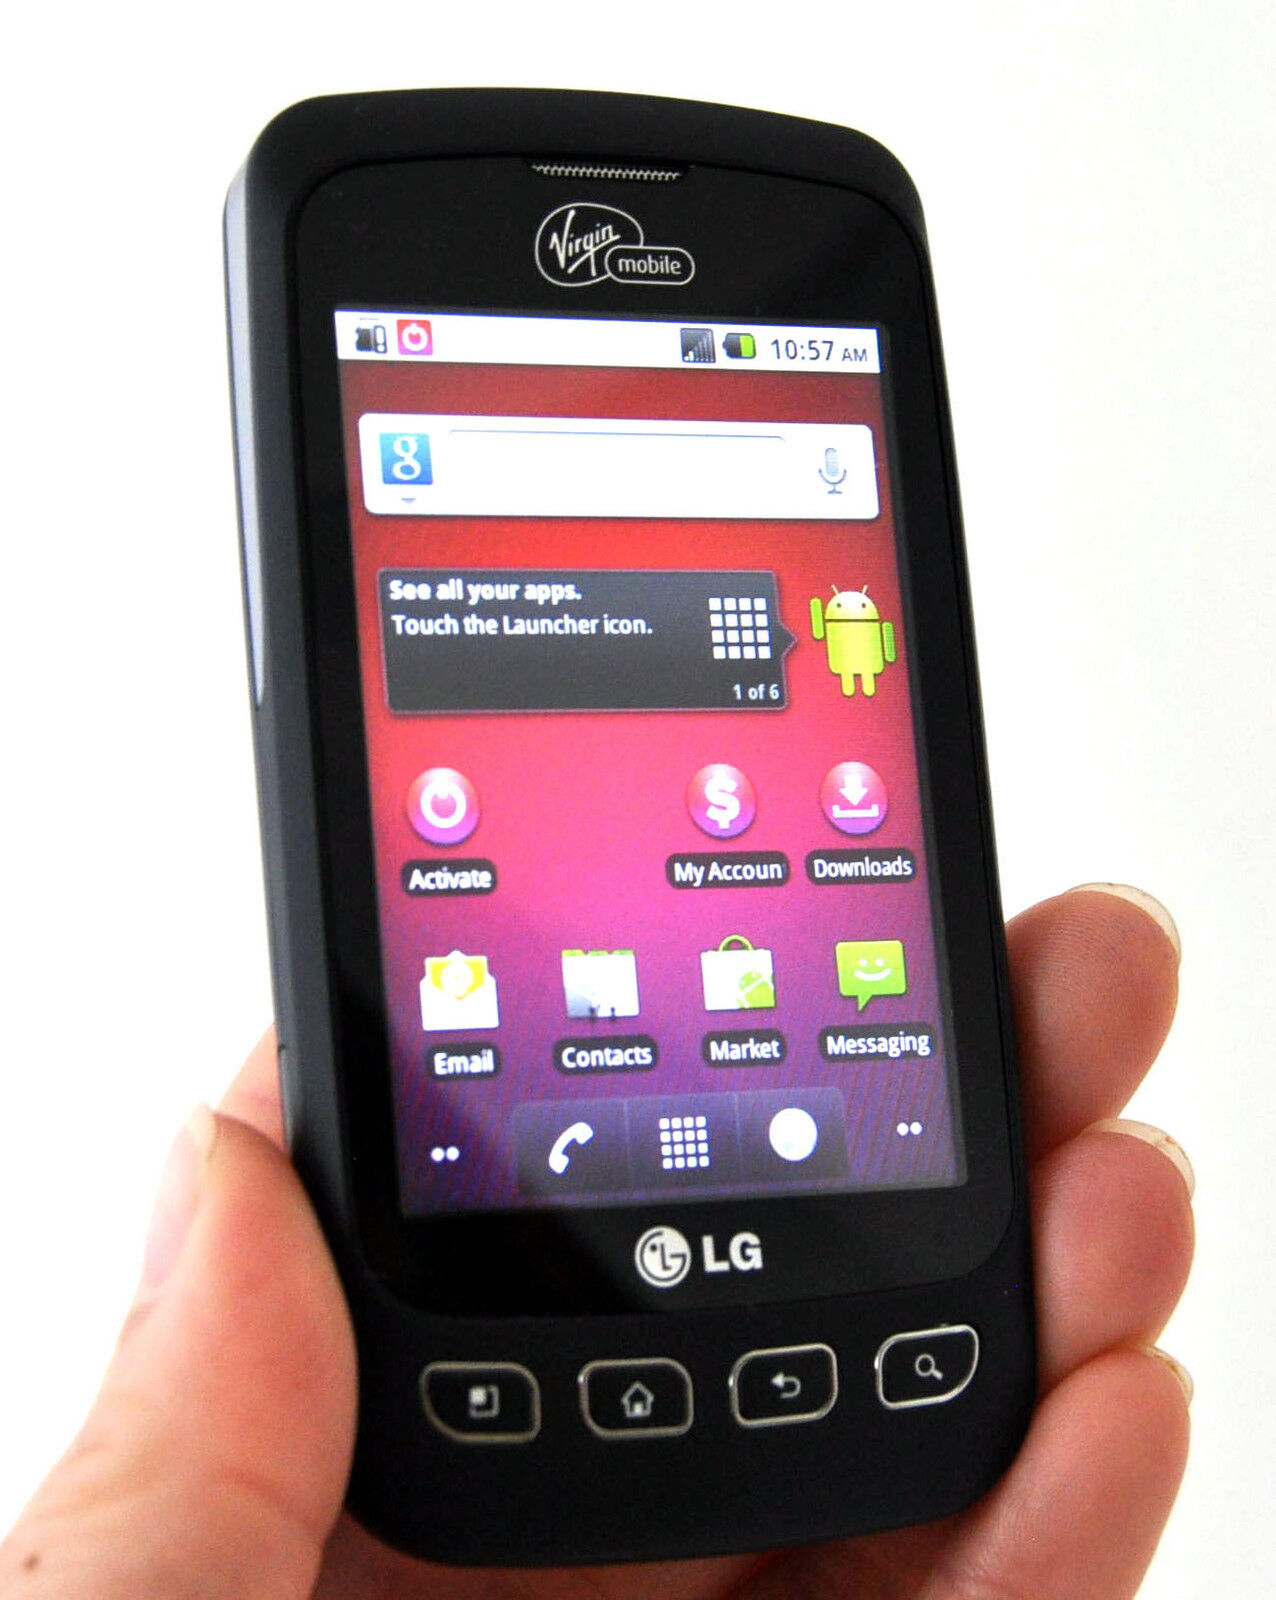 LG Optimus V VM670 Virgin Mobile Wireless Smart Phone BLACK Android WiFi  Touch C